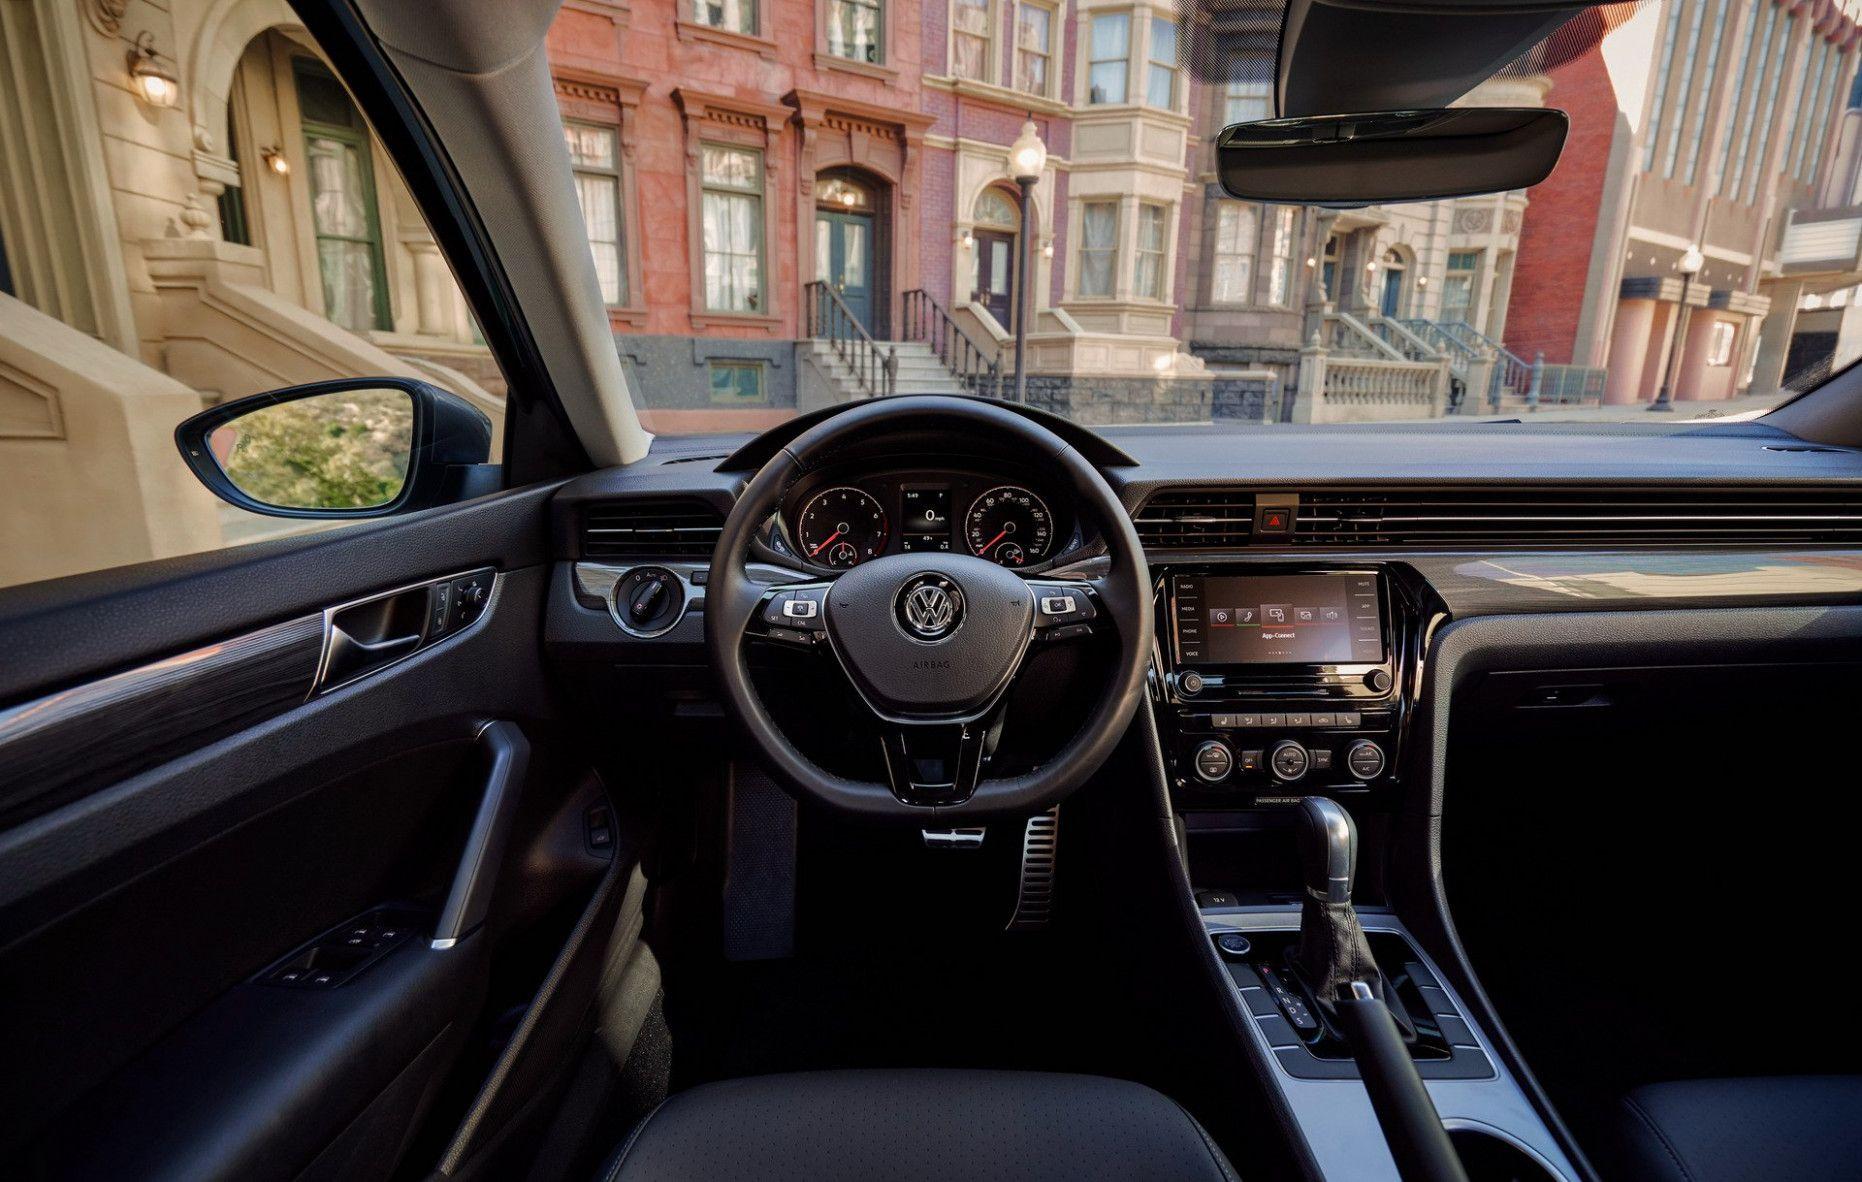 2020 Volkswagen Jetta Interior Picture 2020 Car Reviews